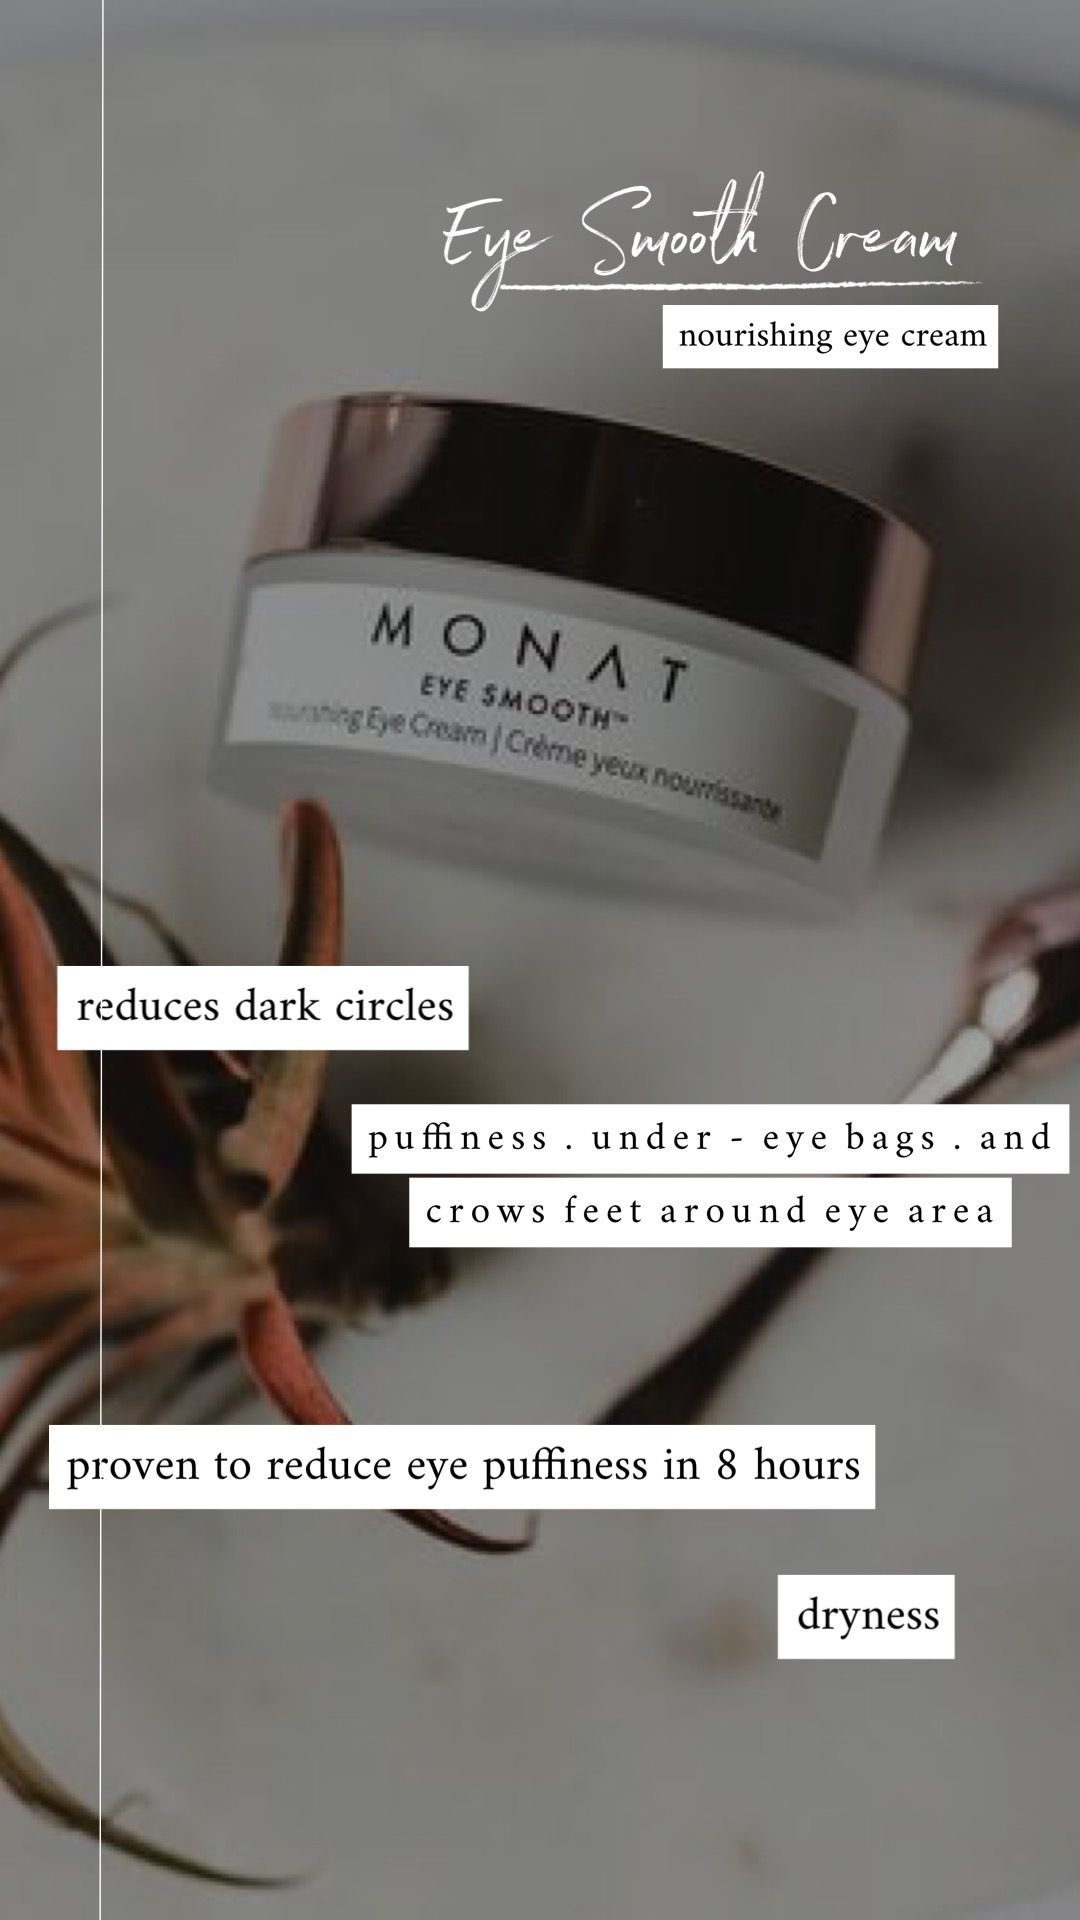 Instagram Tonisledz Monat Market Partner Monat Monat Hair My Monat